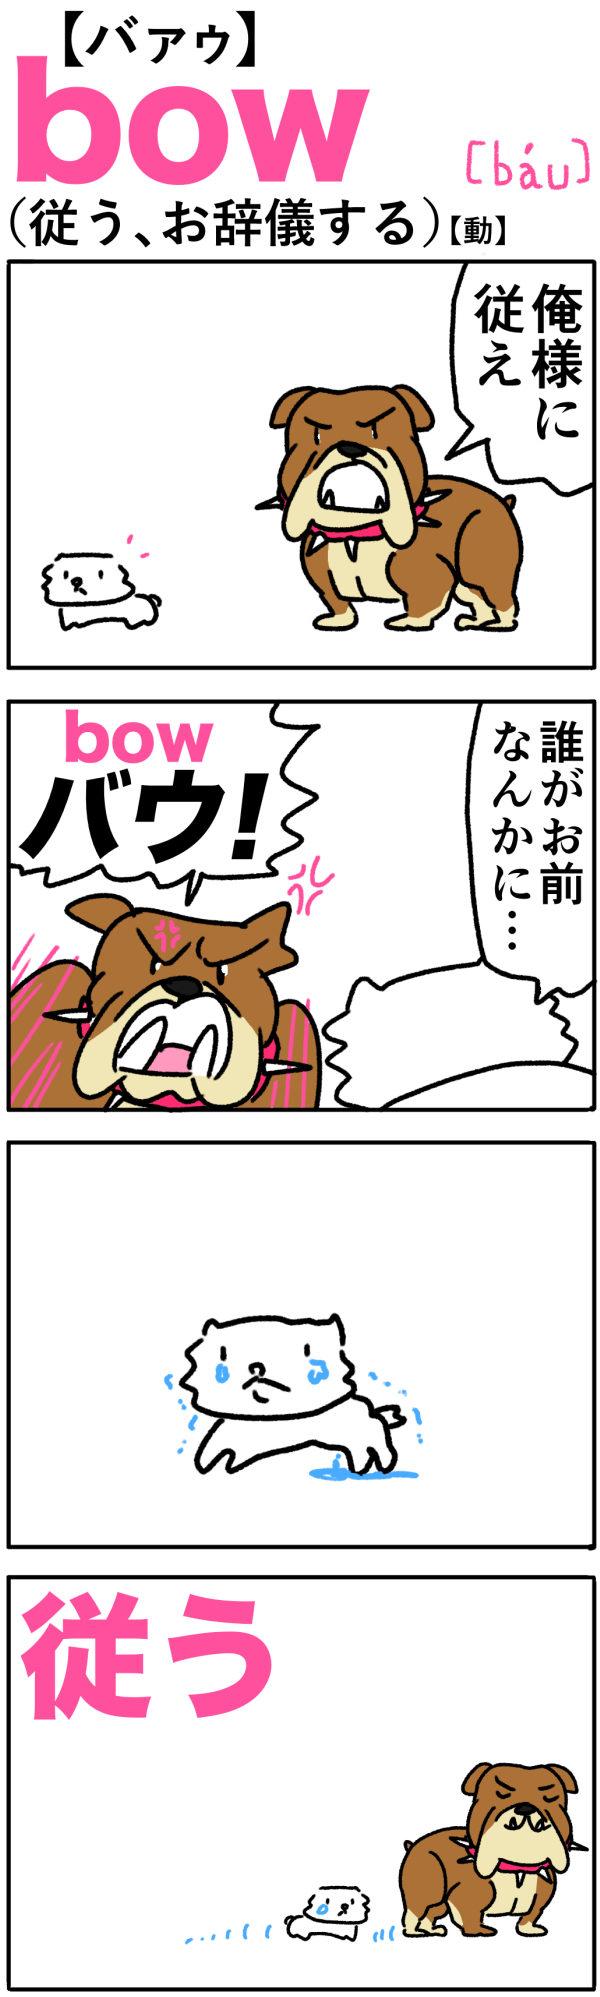 bow(従う、お辞儀する)の語呂合わせ英単語